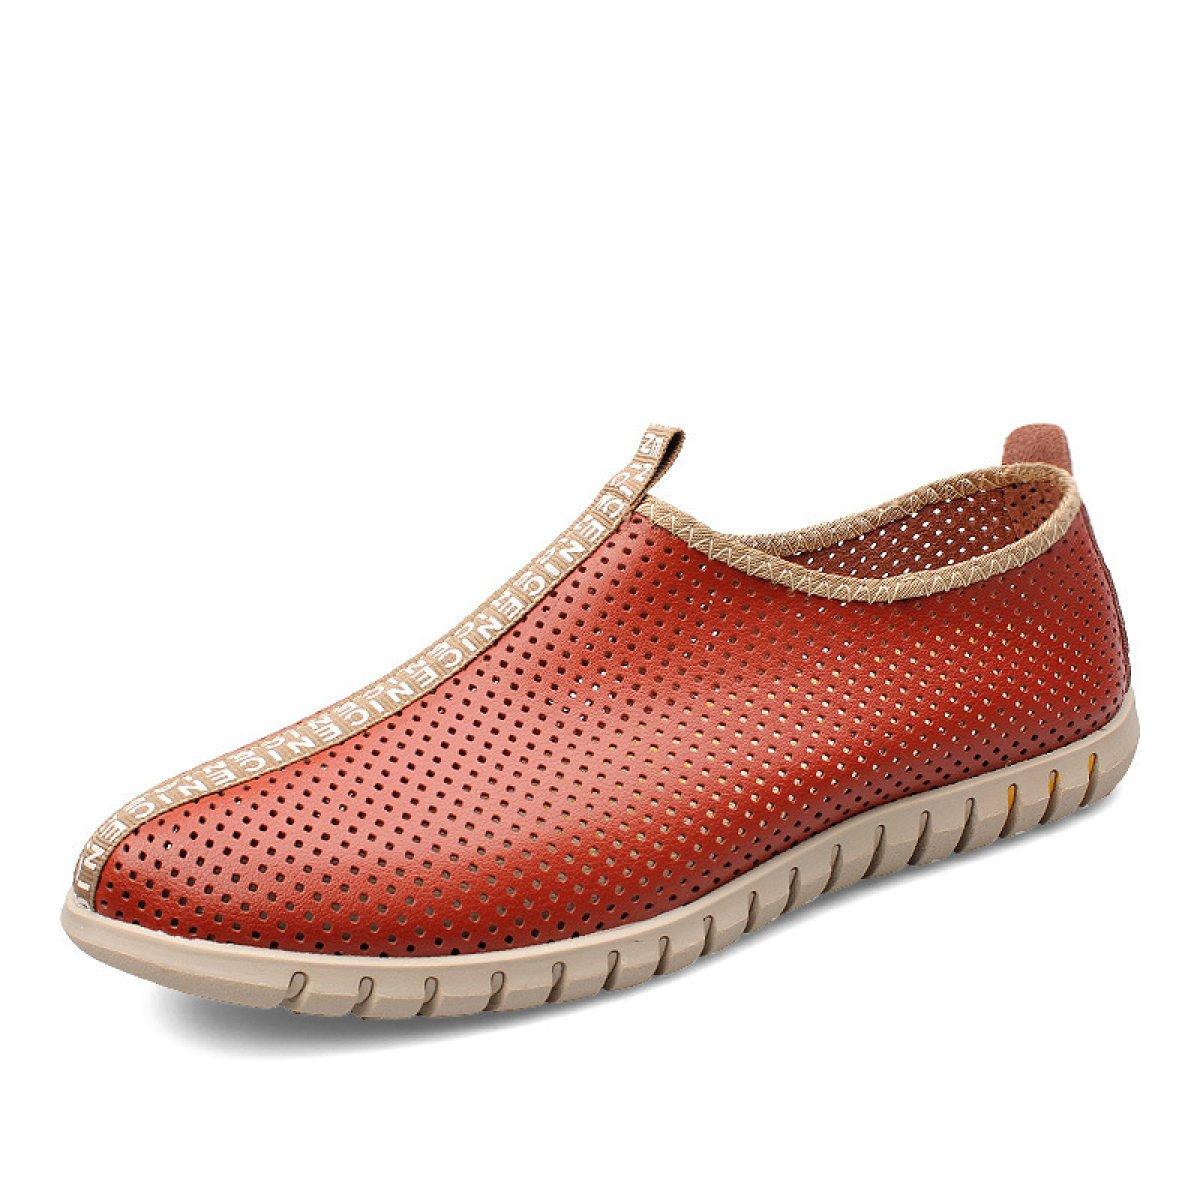 LXXAMens Verano Cuero Casual Zapatos De Trekking Peso Ligero De Malla Transpirable Calzado Deportivo,Orange-39EU 39EU Orange